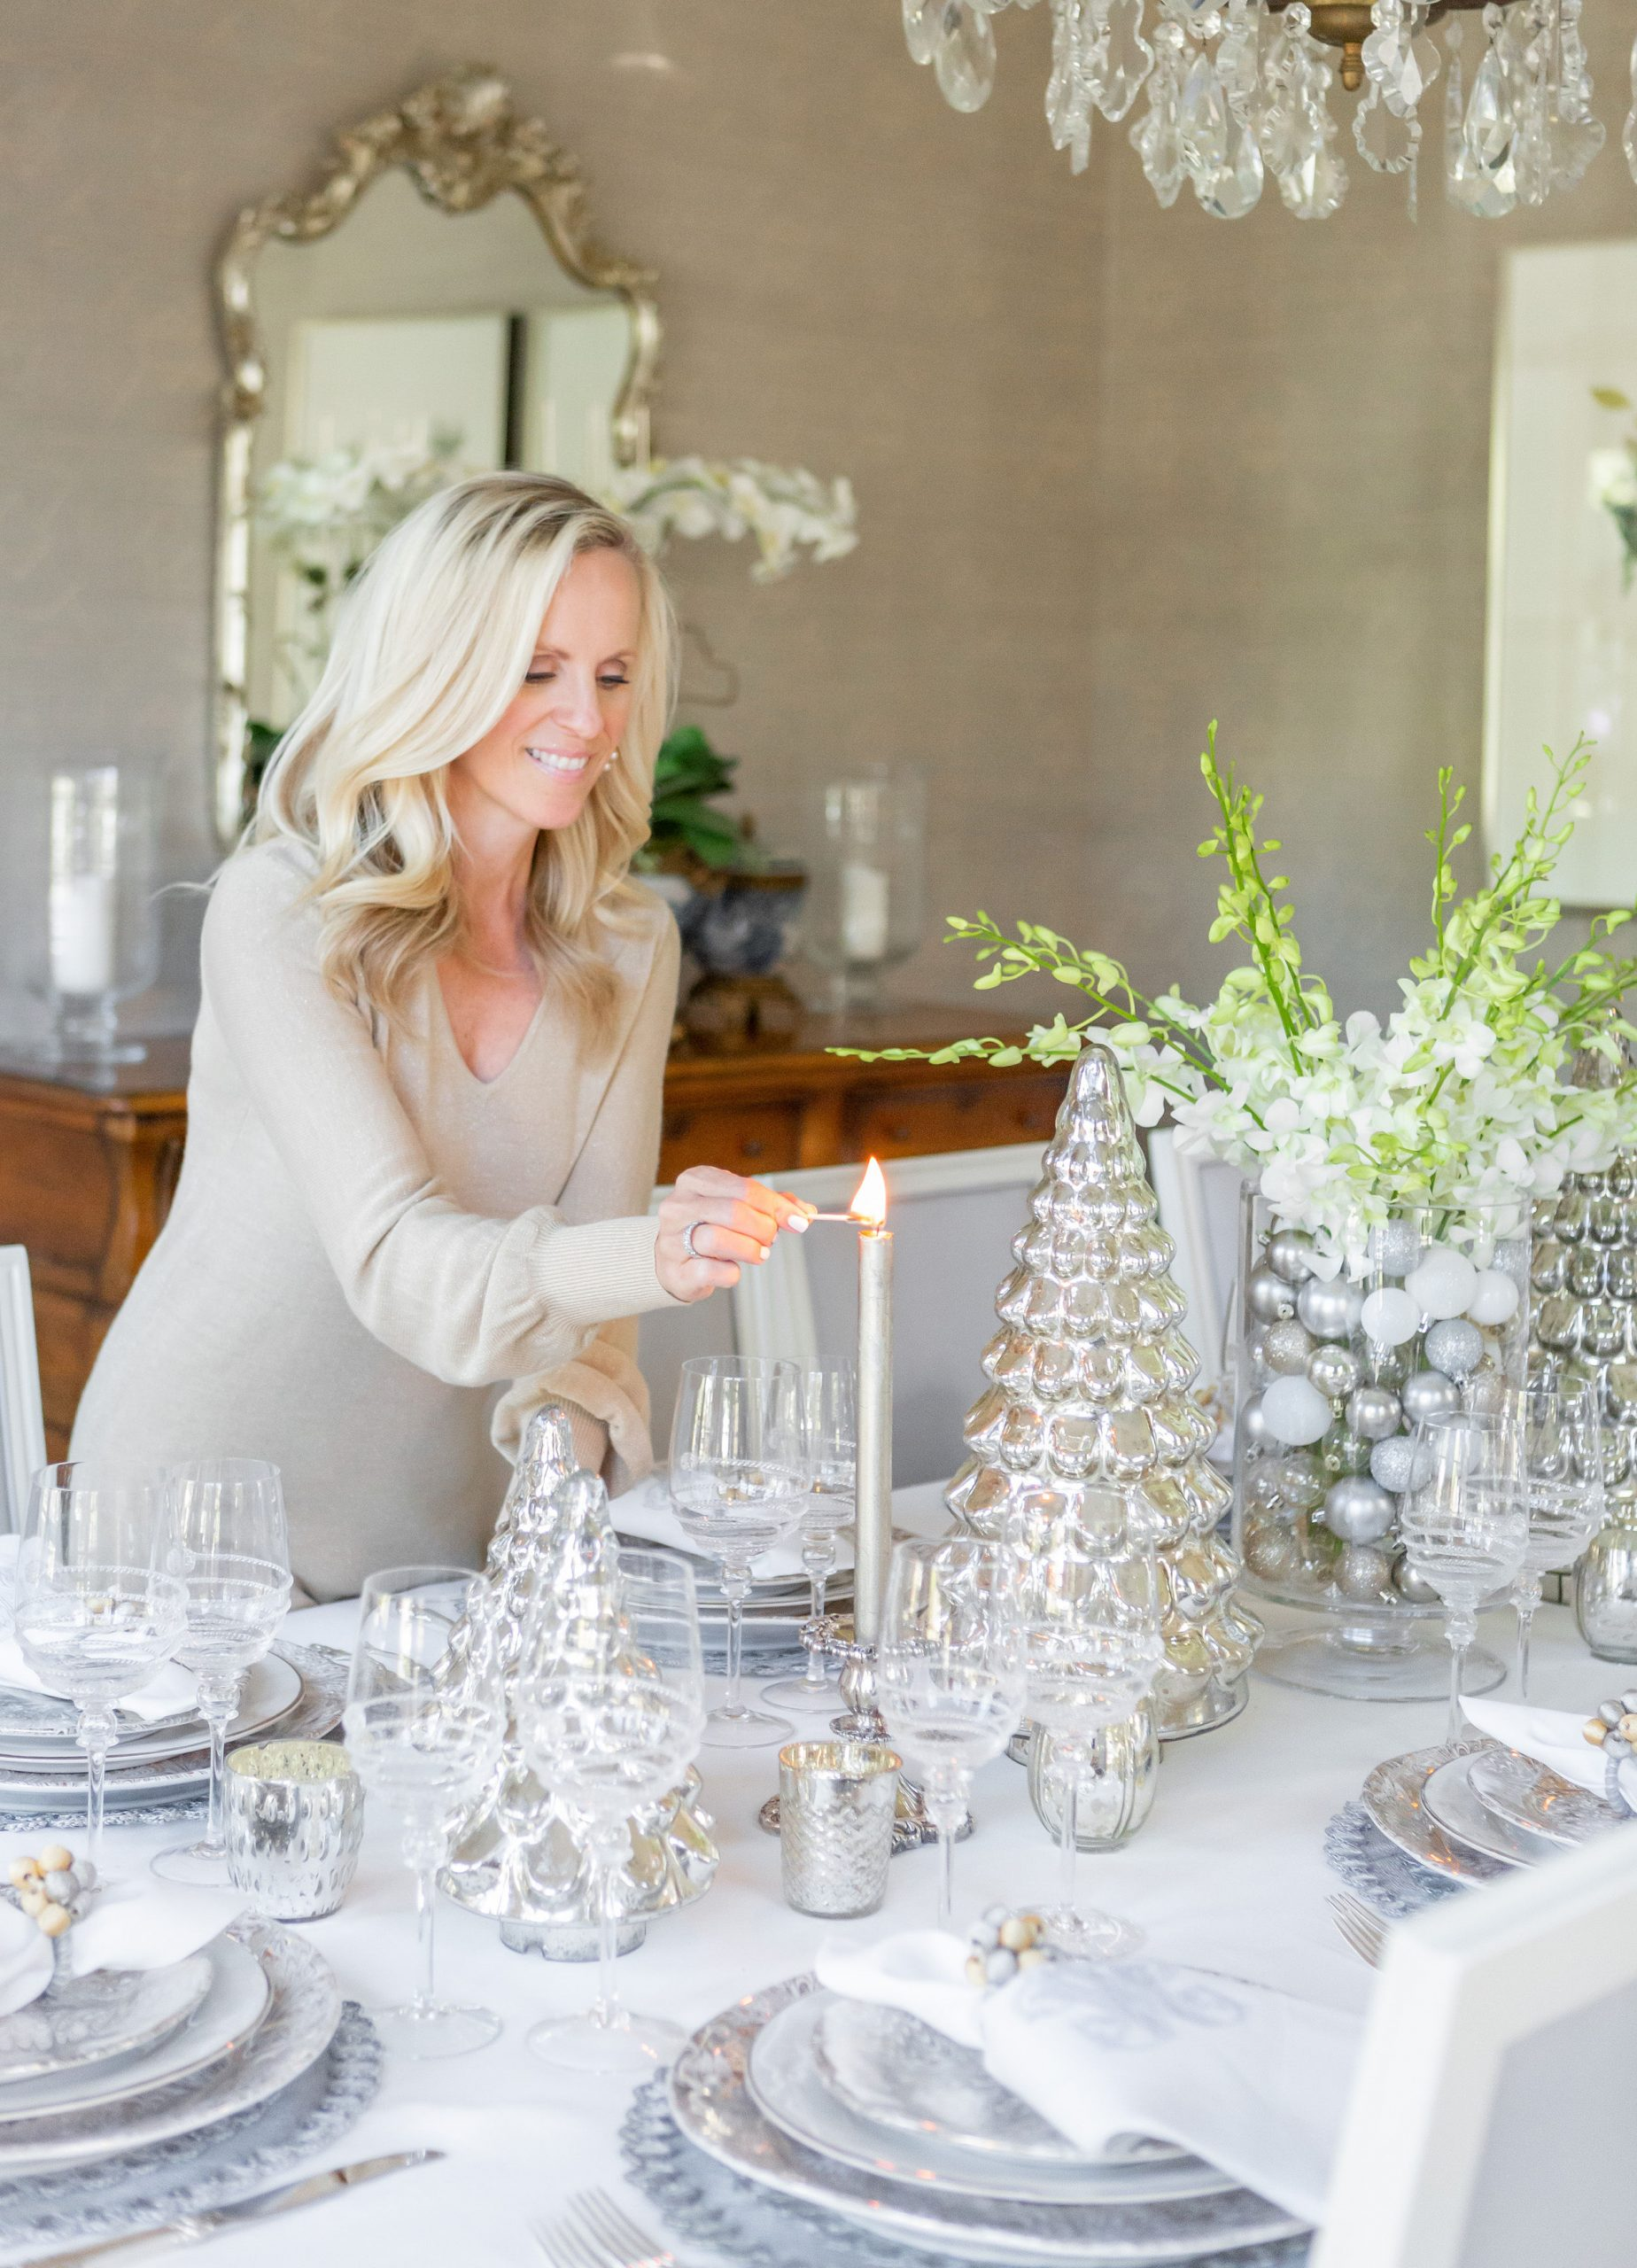 Alicia Wood, Dallas Lifestyle Expert, Dallas Fashion blogger, Dallas Lifestyle Blog, Elegant Christmas Tablescape